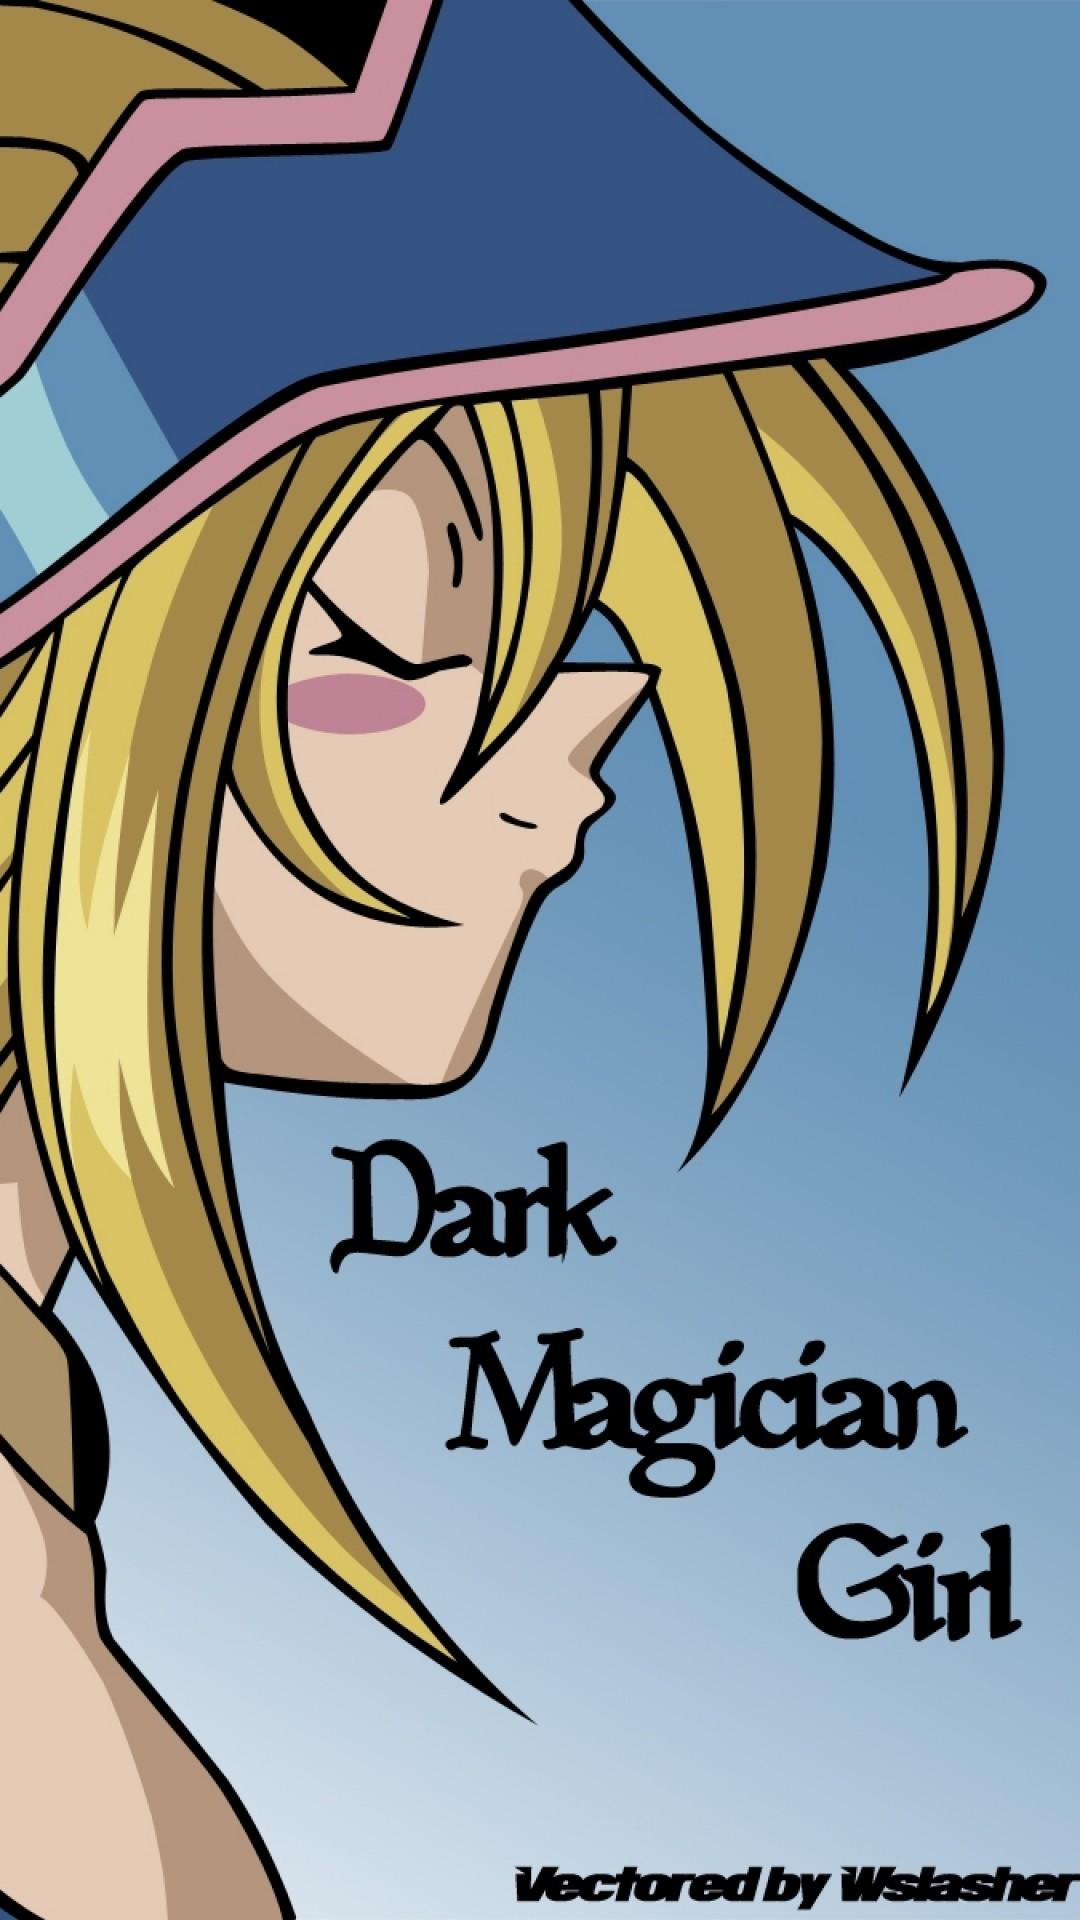 Wallpaper yu-gi-oh, dark magician, girl, blonde, profile